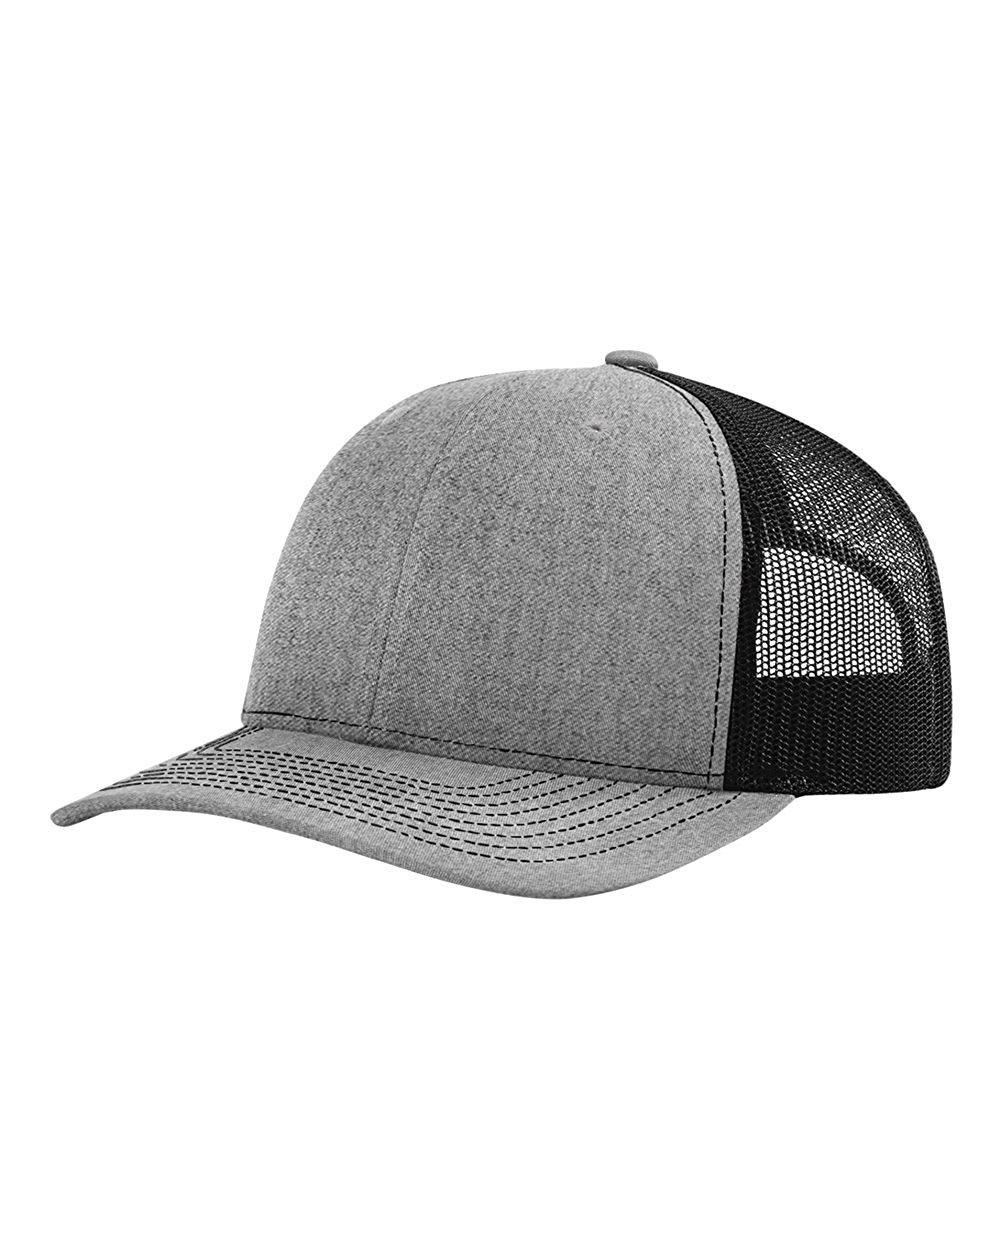 Richardson Trucker Snapback Cap,Heather Grey/Black,Adjustable